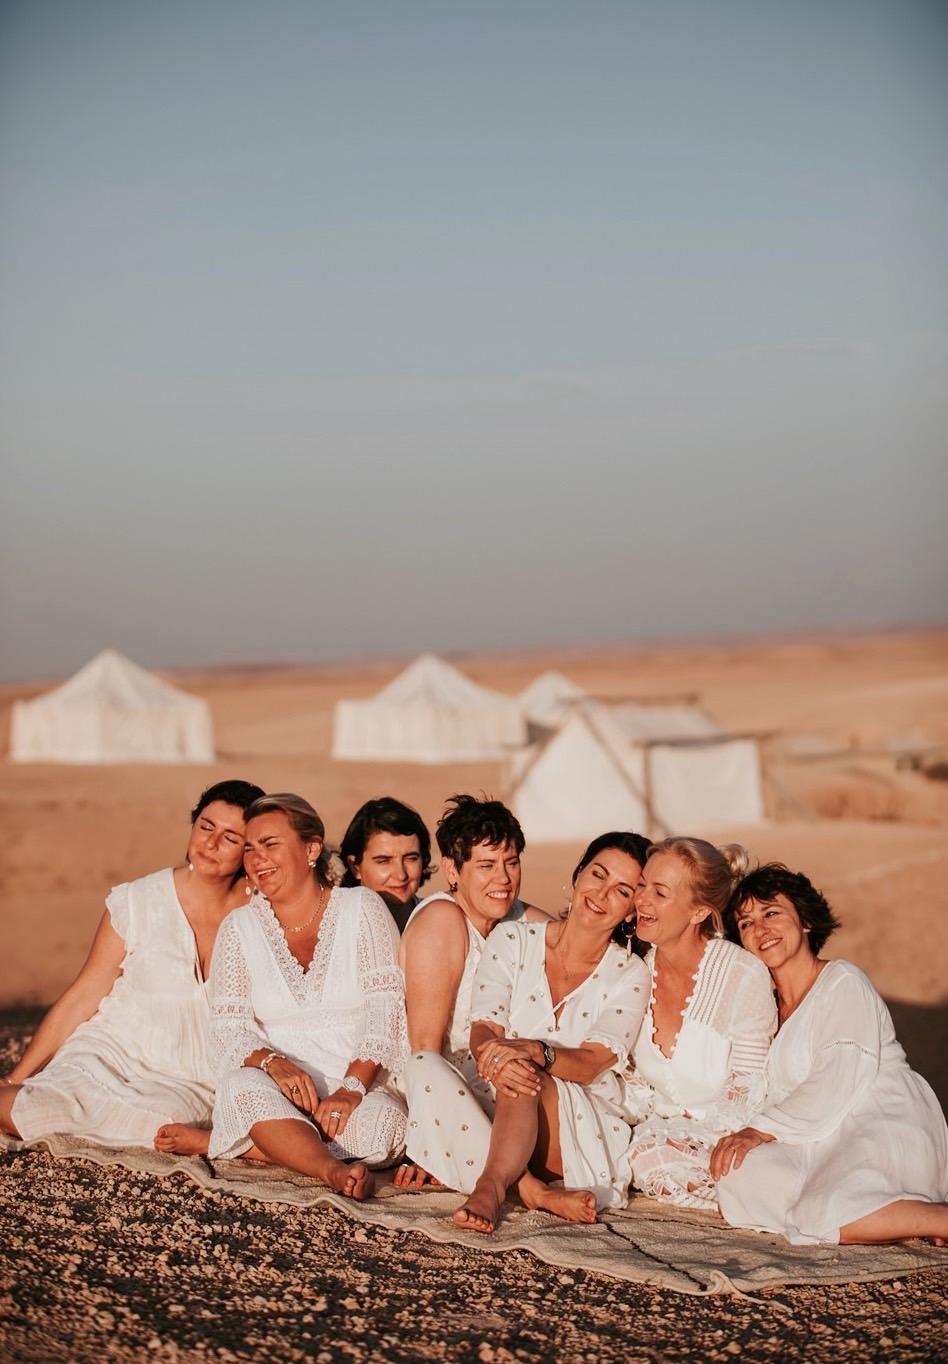 activités EVJF à Marrakech